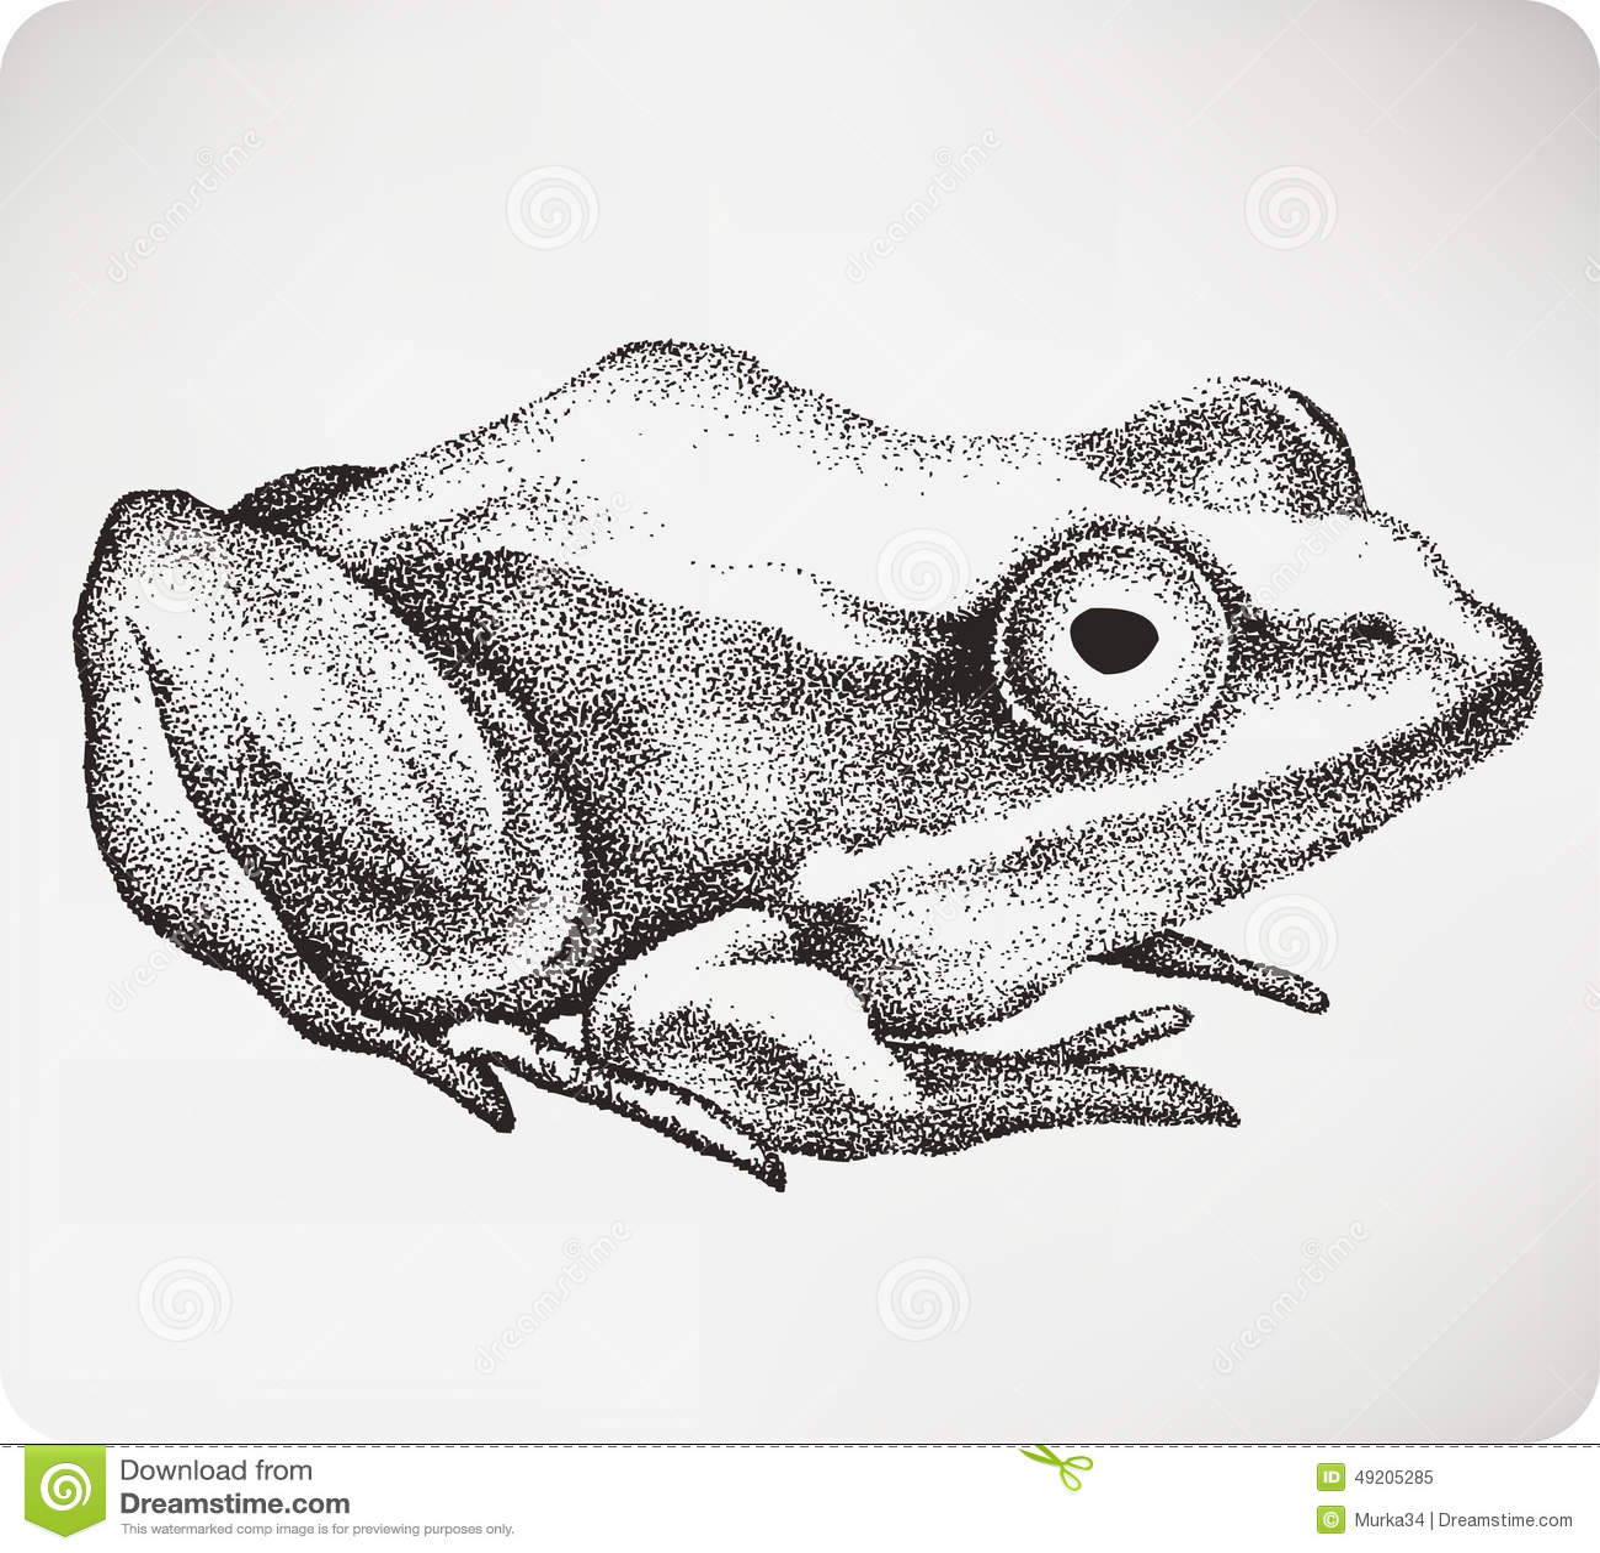 Crapaud animal main dessin illustration de vecteur jpg illustration de vecteur image 49205285 - Dessin crapaud ...